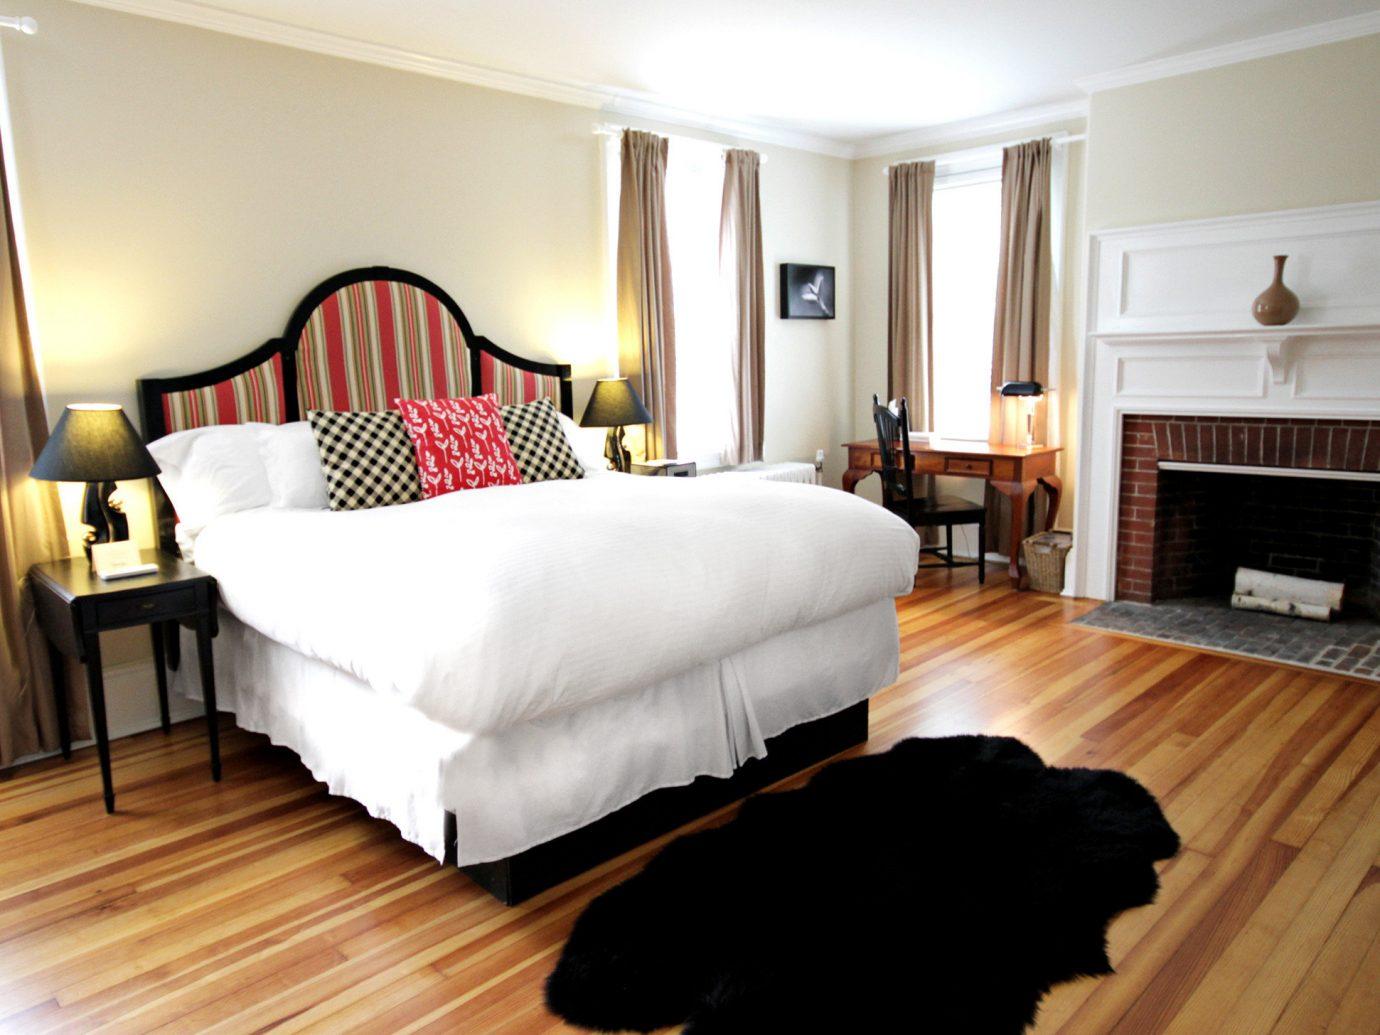 Bedroom Classic Country Inn Suite floor indoor wall room Living ceiling property wood furniture hardwood cottage interior design estate real estate bed wood flooring rug hard flat